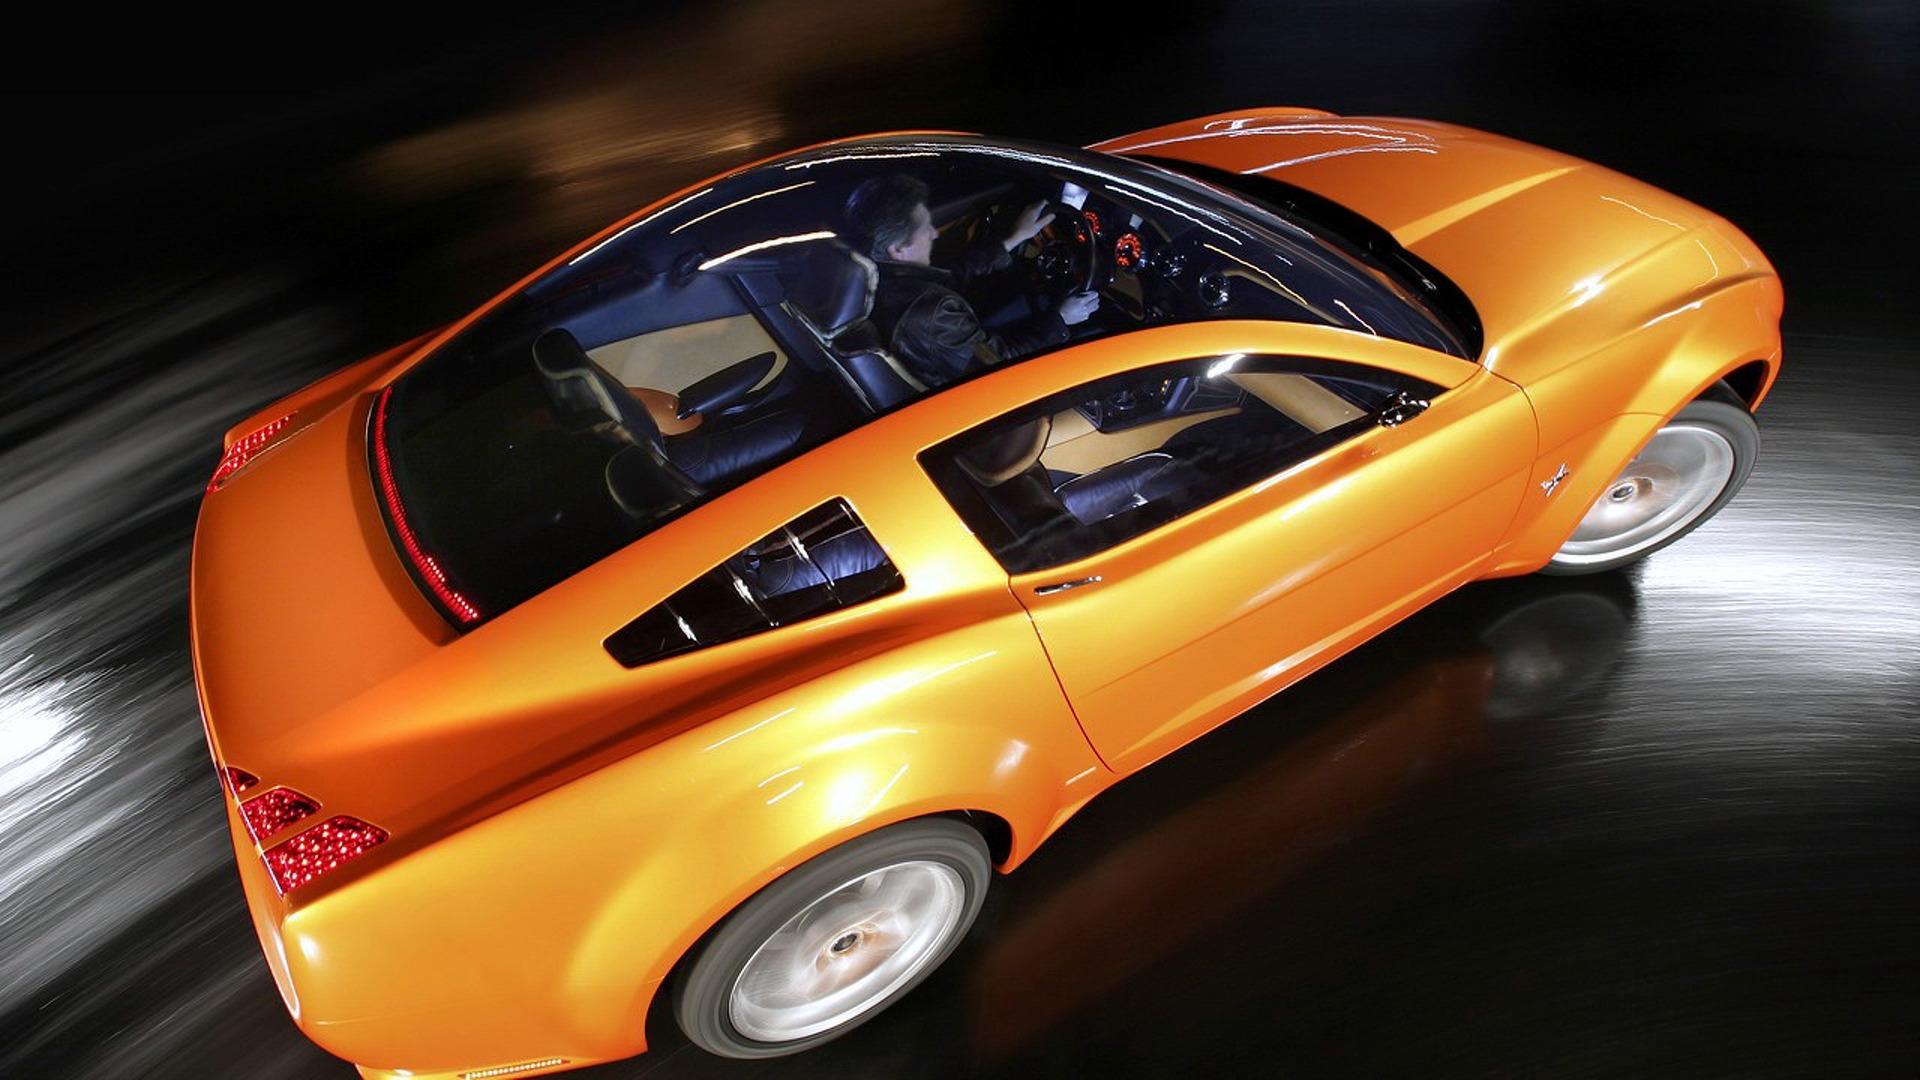 2006-ford-mustang-giugiaro-concept (20)